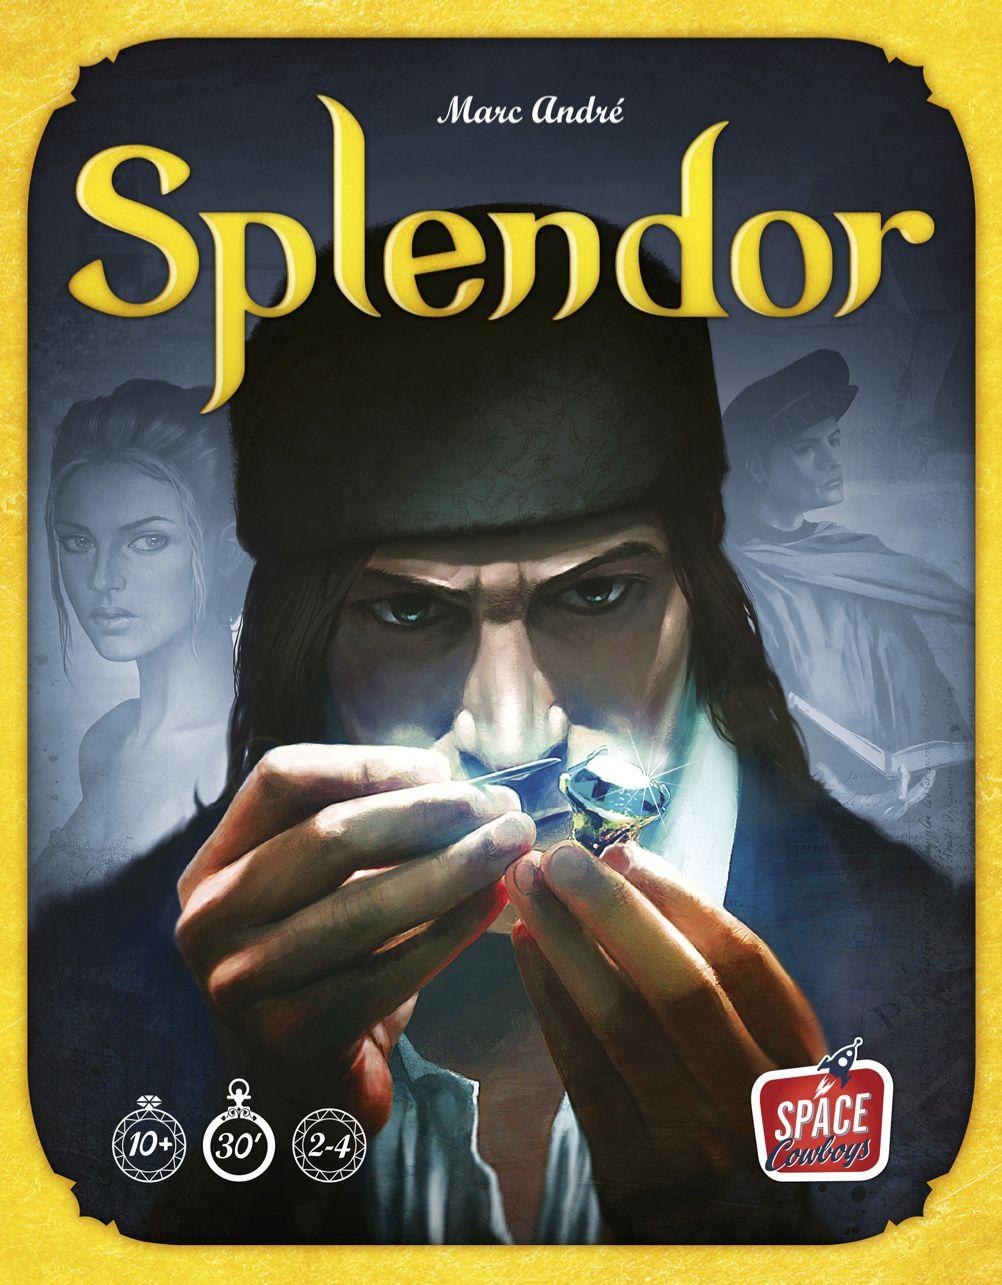 splendor board game - Google Search